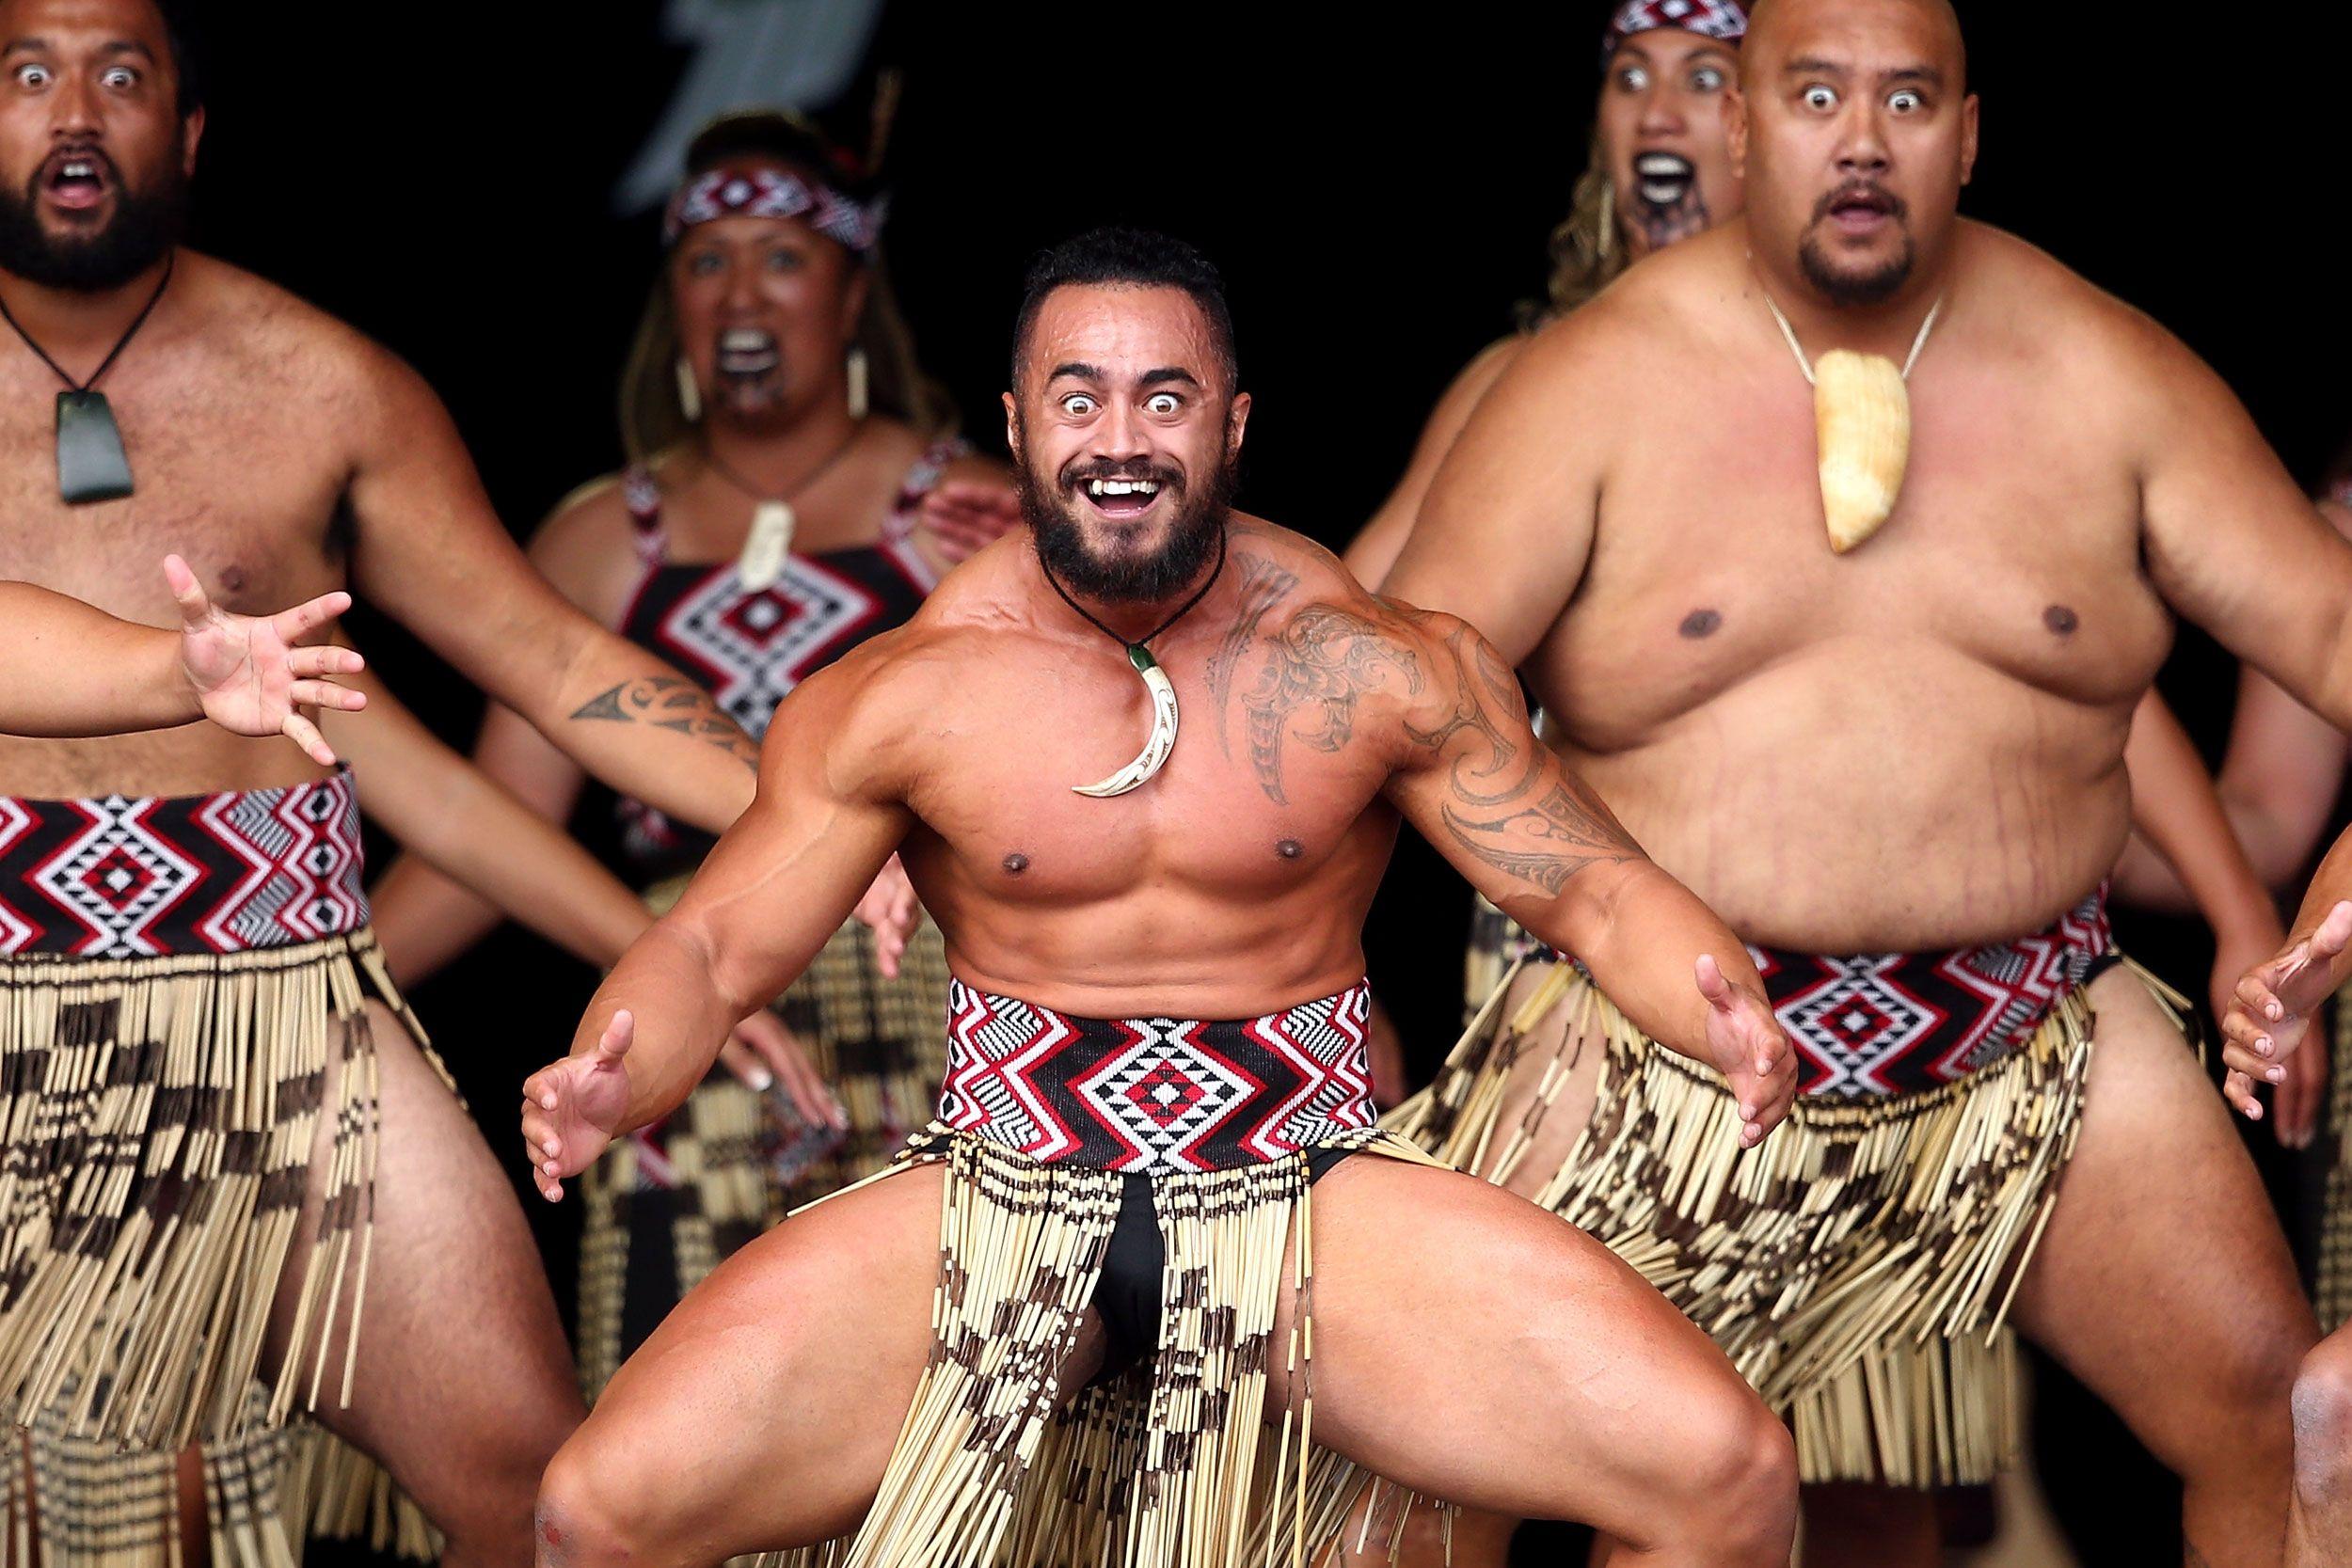 Maori Dancers: PsBattle: Maori Dancer At The National Kapa Haka Festival